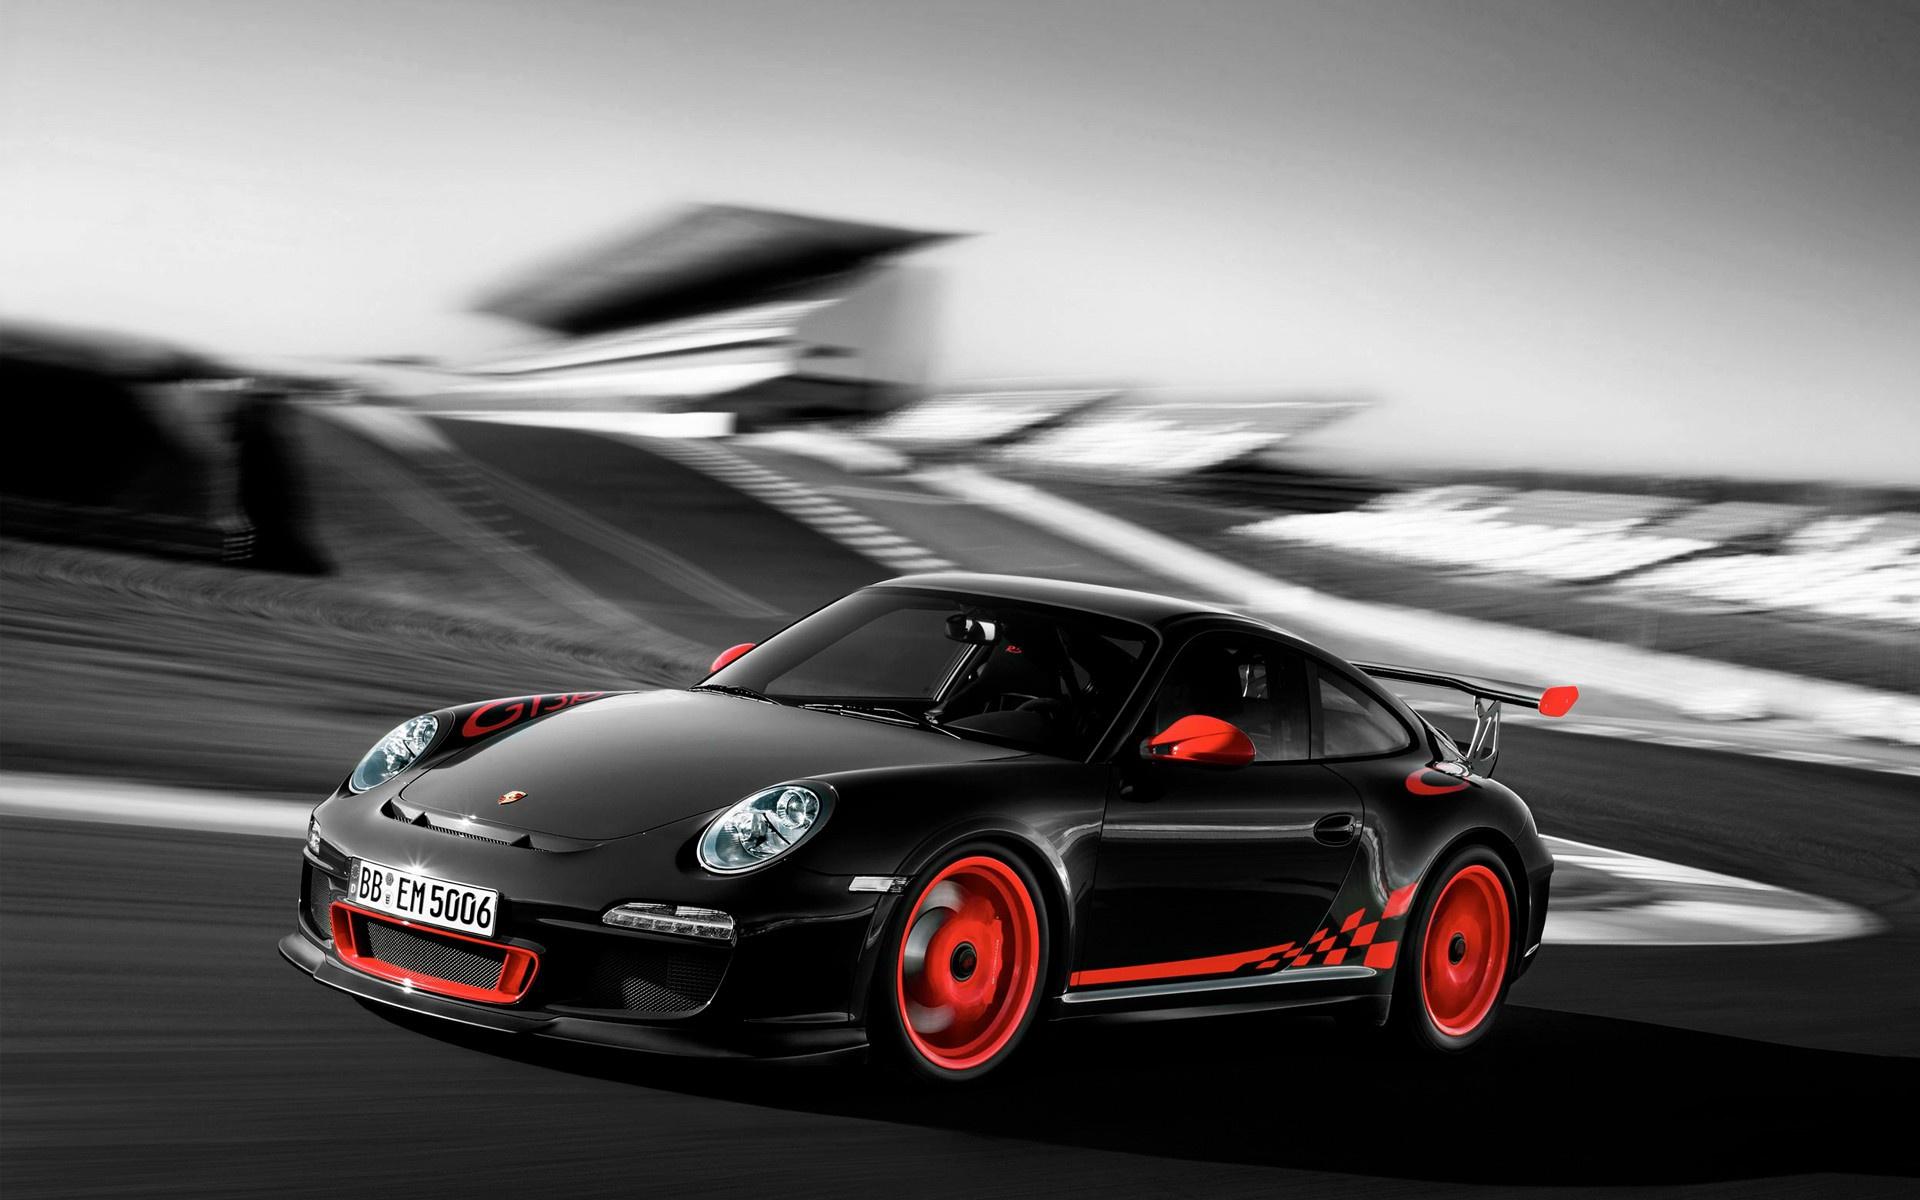 25 Porsche Gt3 Rs Black And Orange Wallpaper On Wallpapersafari